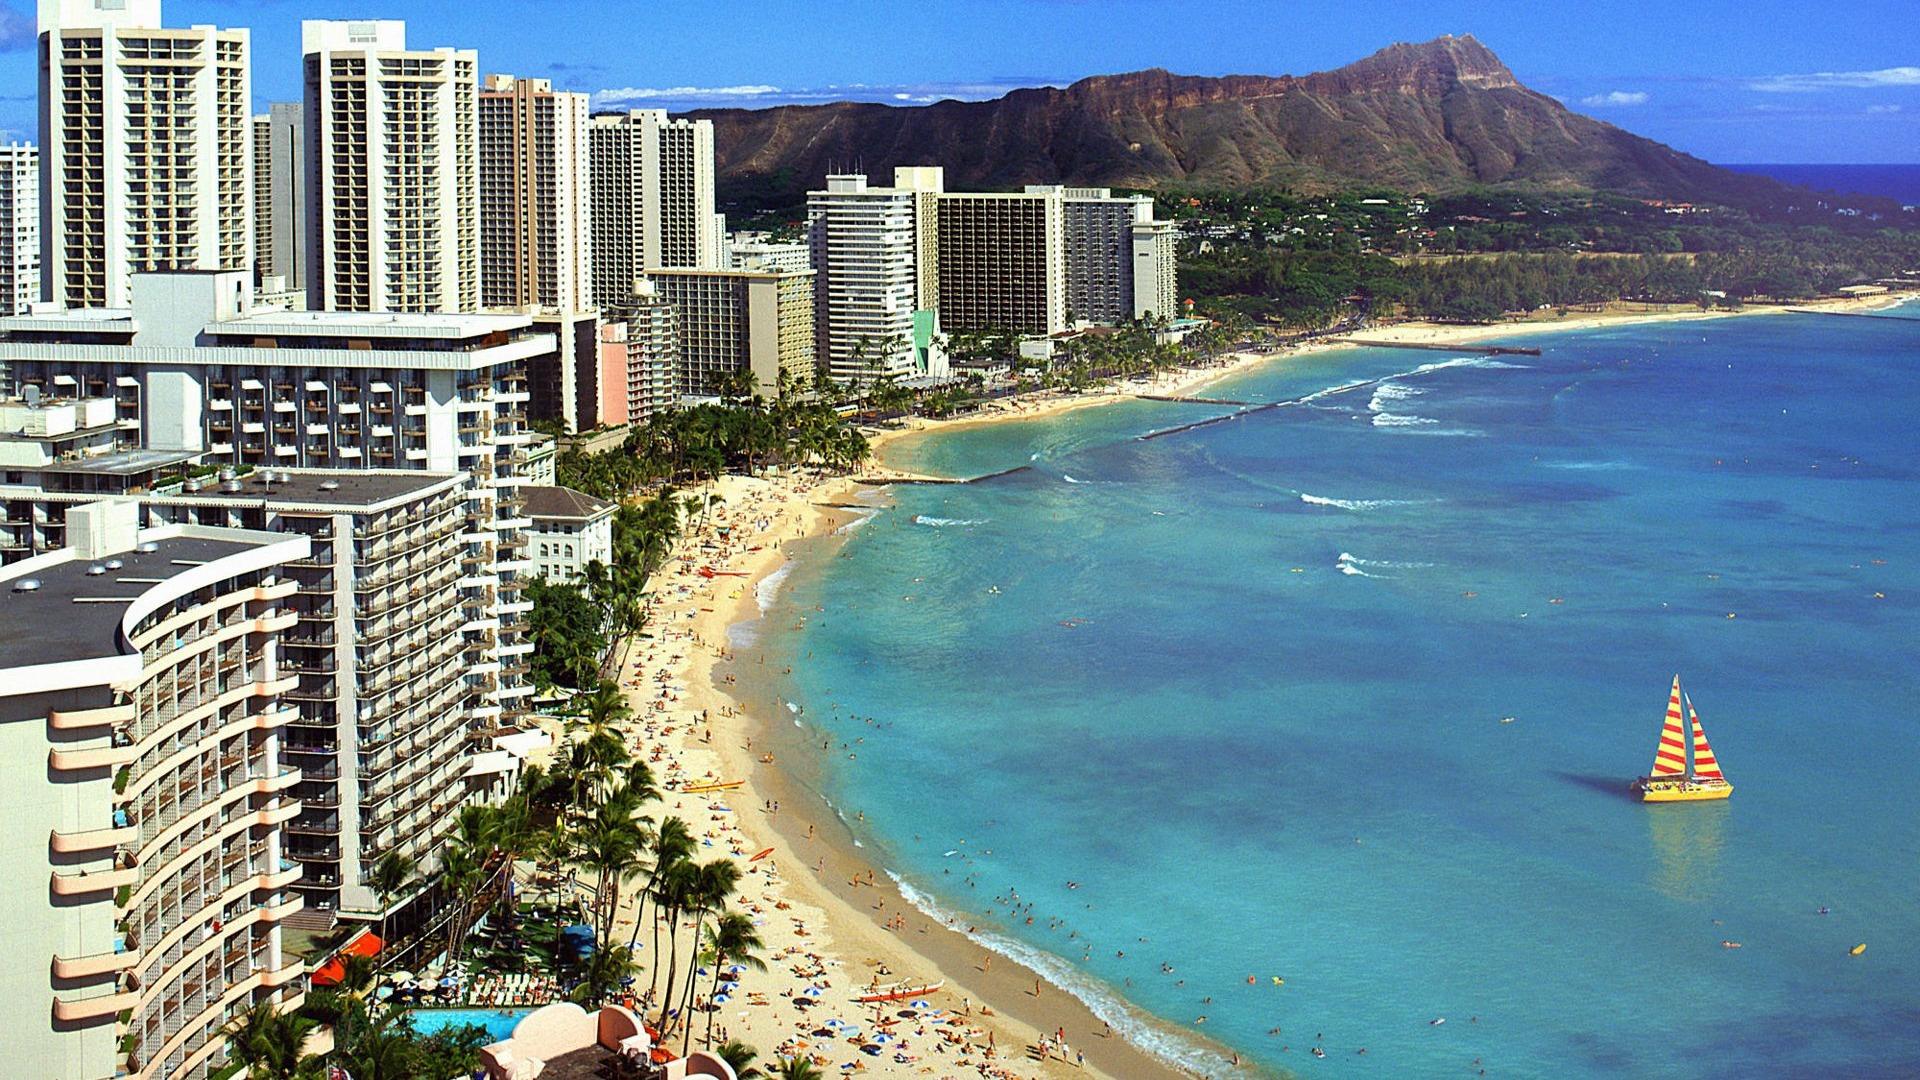 Waikiki Beach Wallpaper Hd: ハワイ - ダイアモンドヘッドとワイキキビーチの壁紙プレビュー